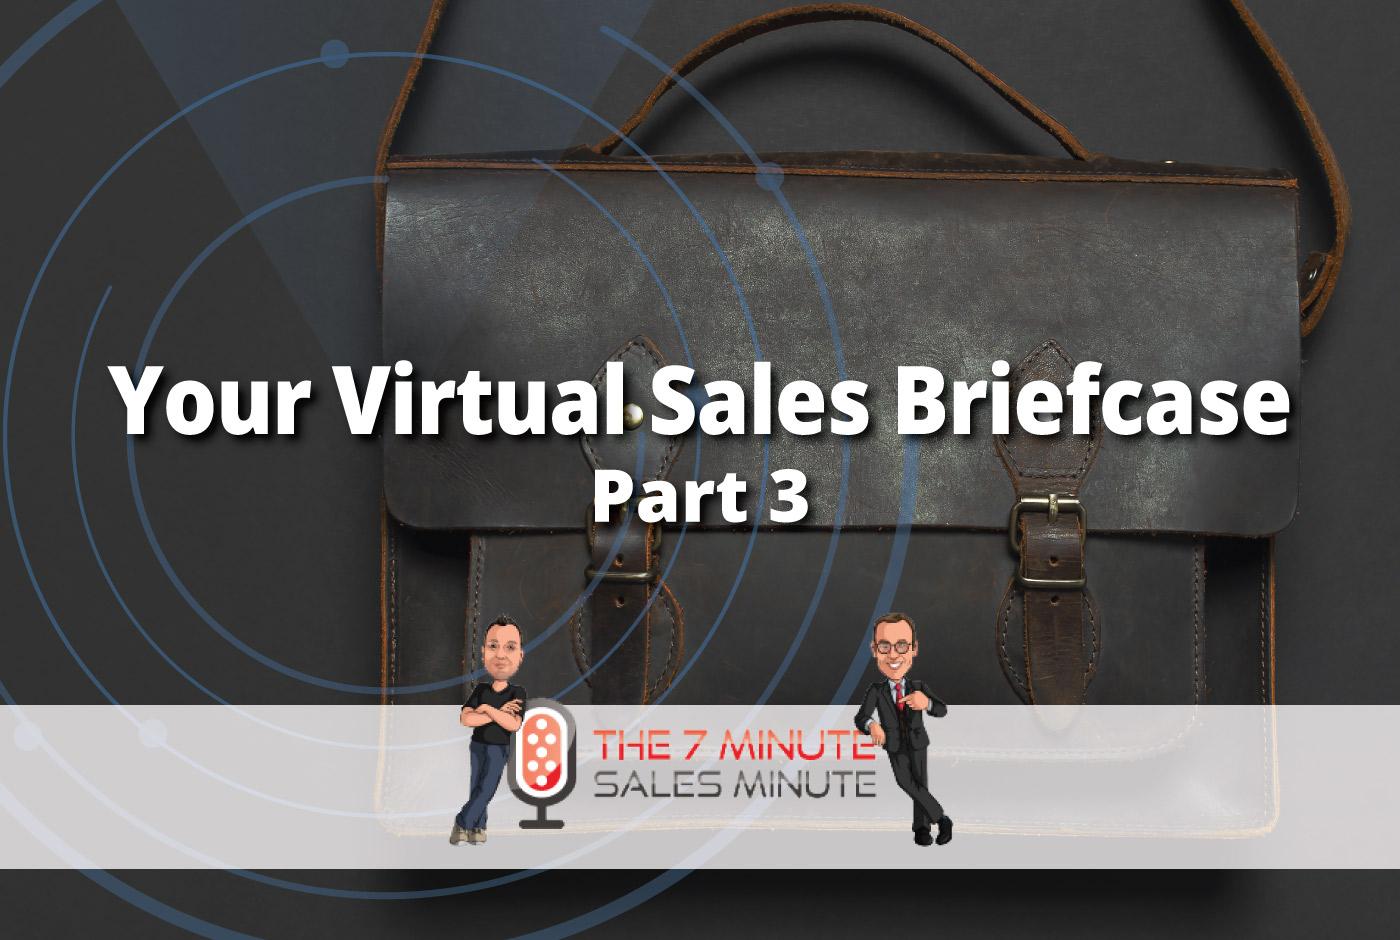 7 Minute Sales Minute Podcast: Season 13 - Episode 7 - Your Virtual Sales Briefcase - Part 3